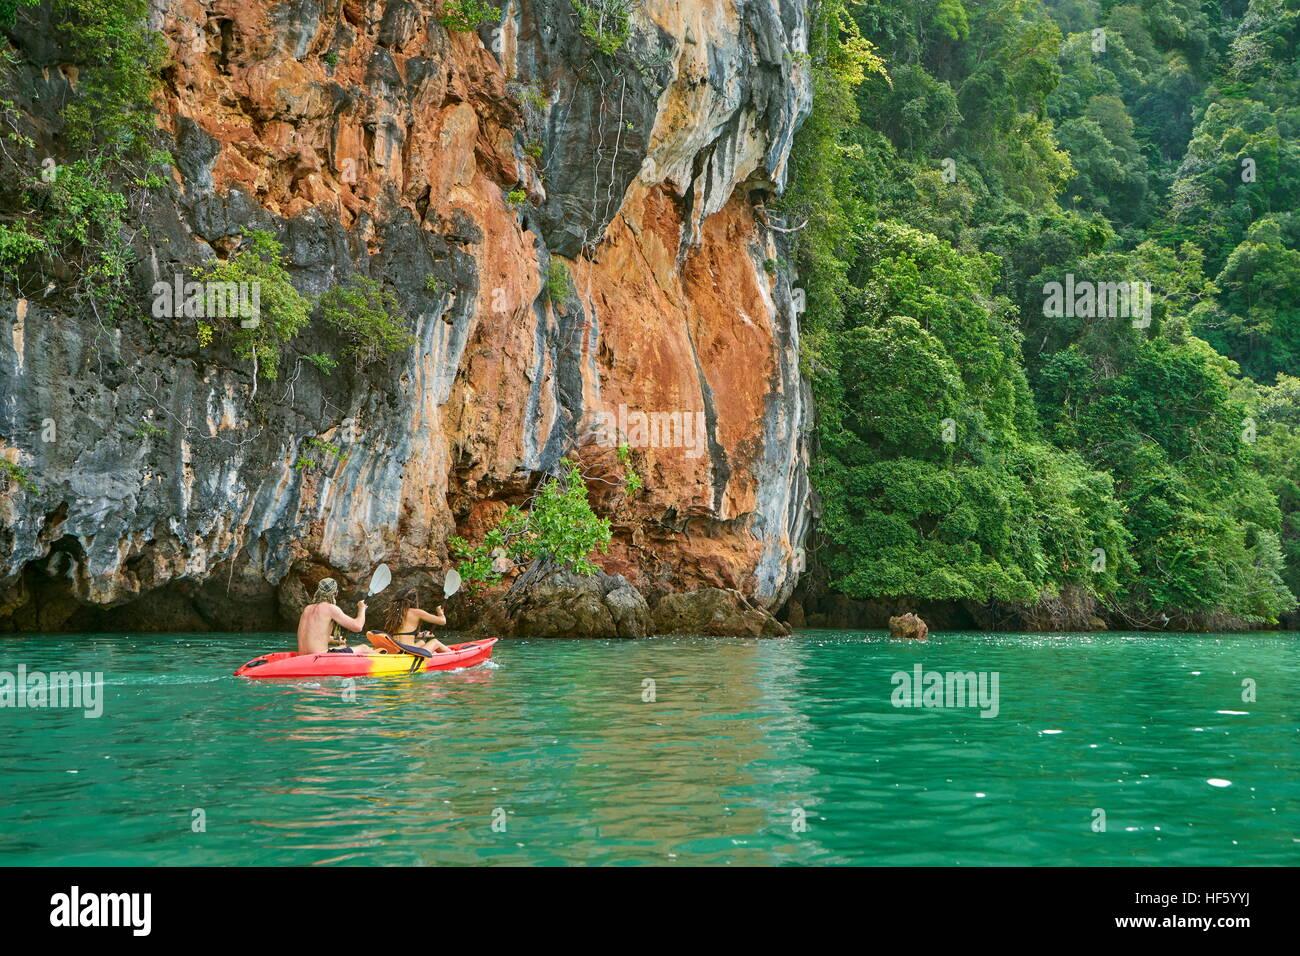 Kyaking at Ko Talabeng Island, Krabi Province, Thailand - Stock Image